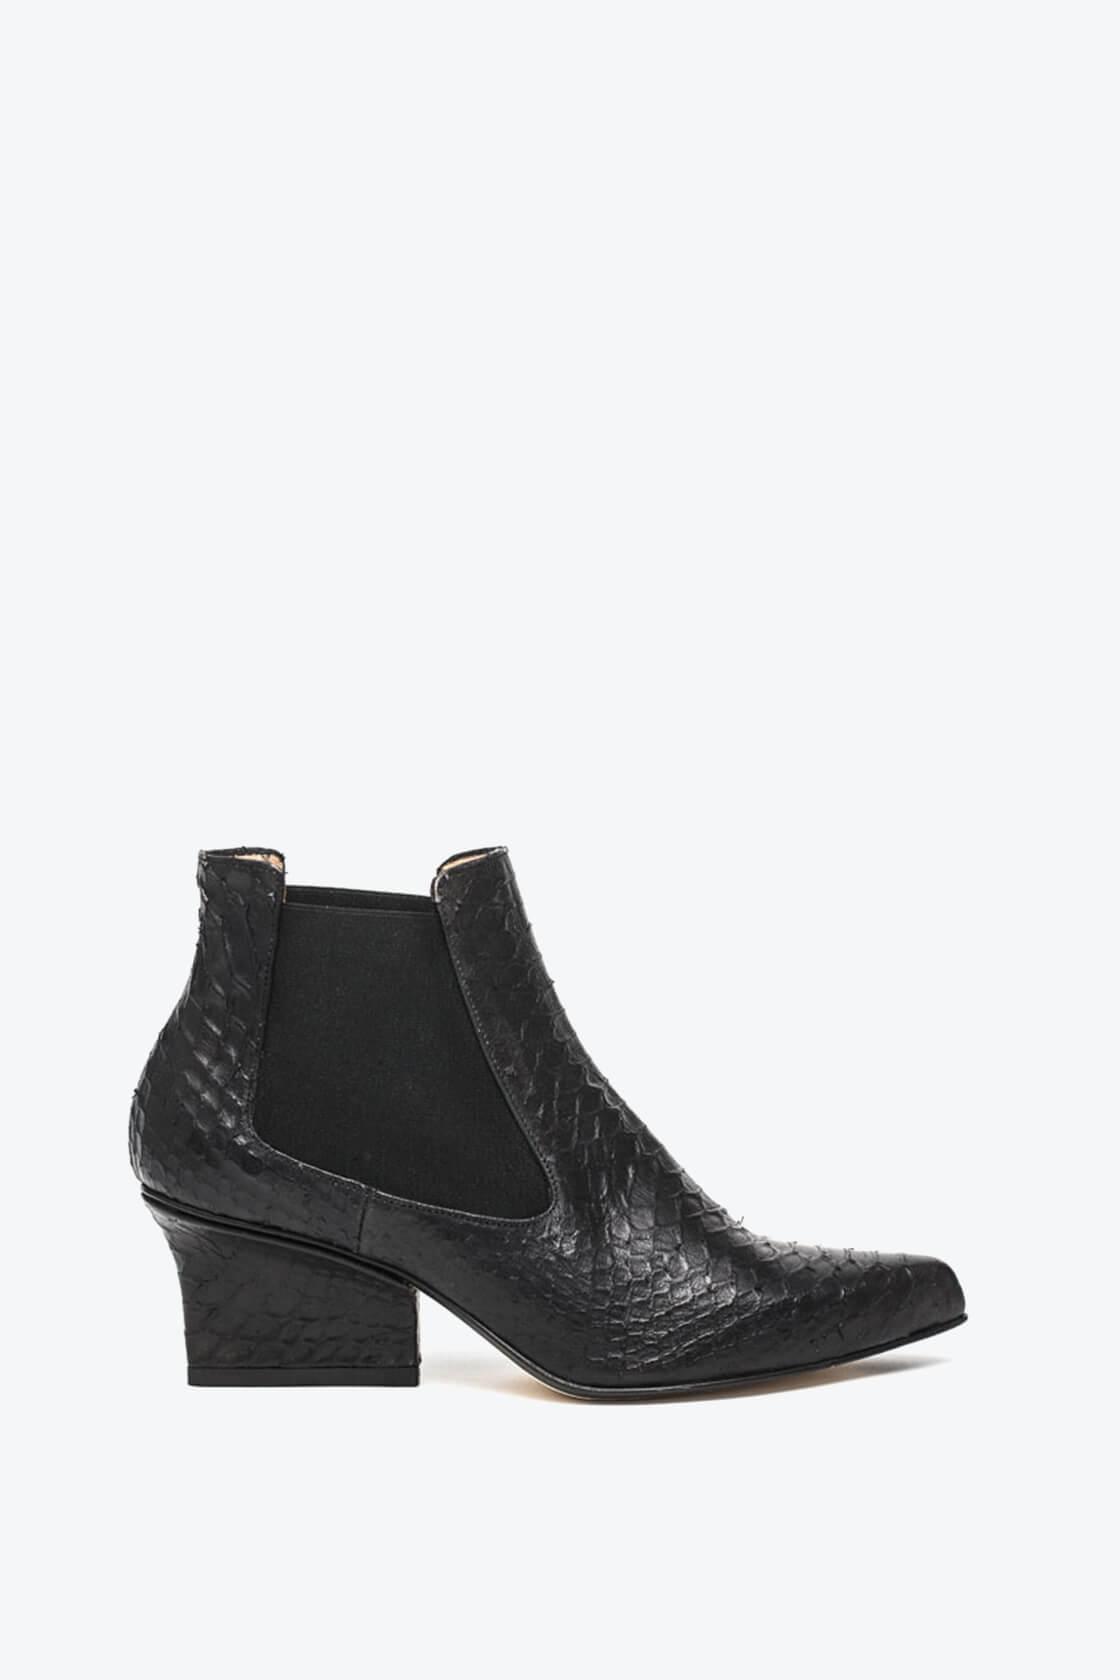 EJK0000046 Nena chelsea boots black python 1